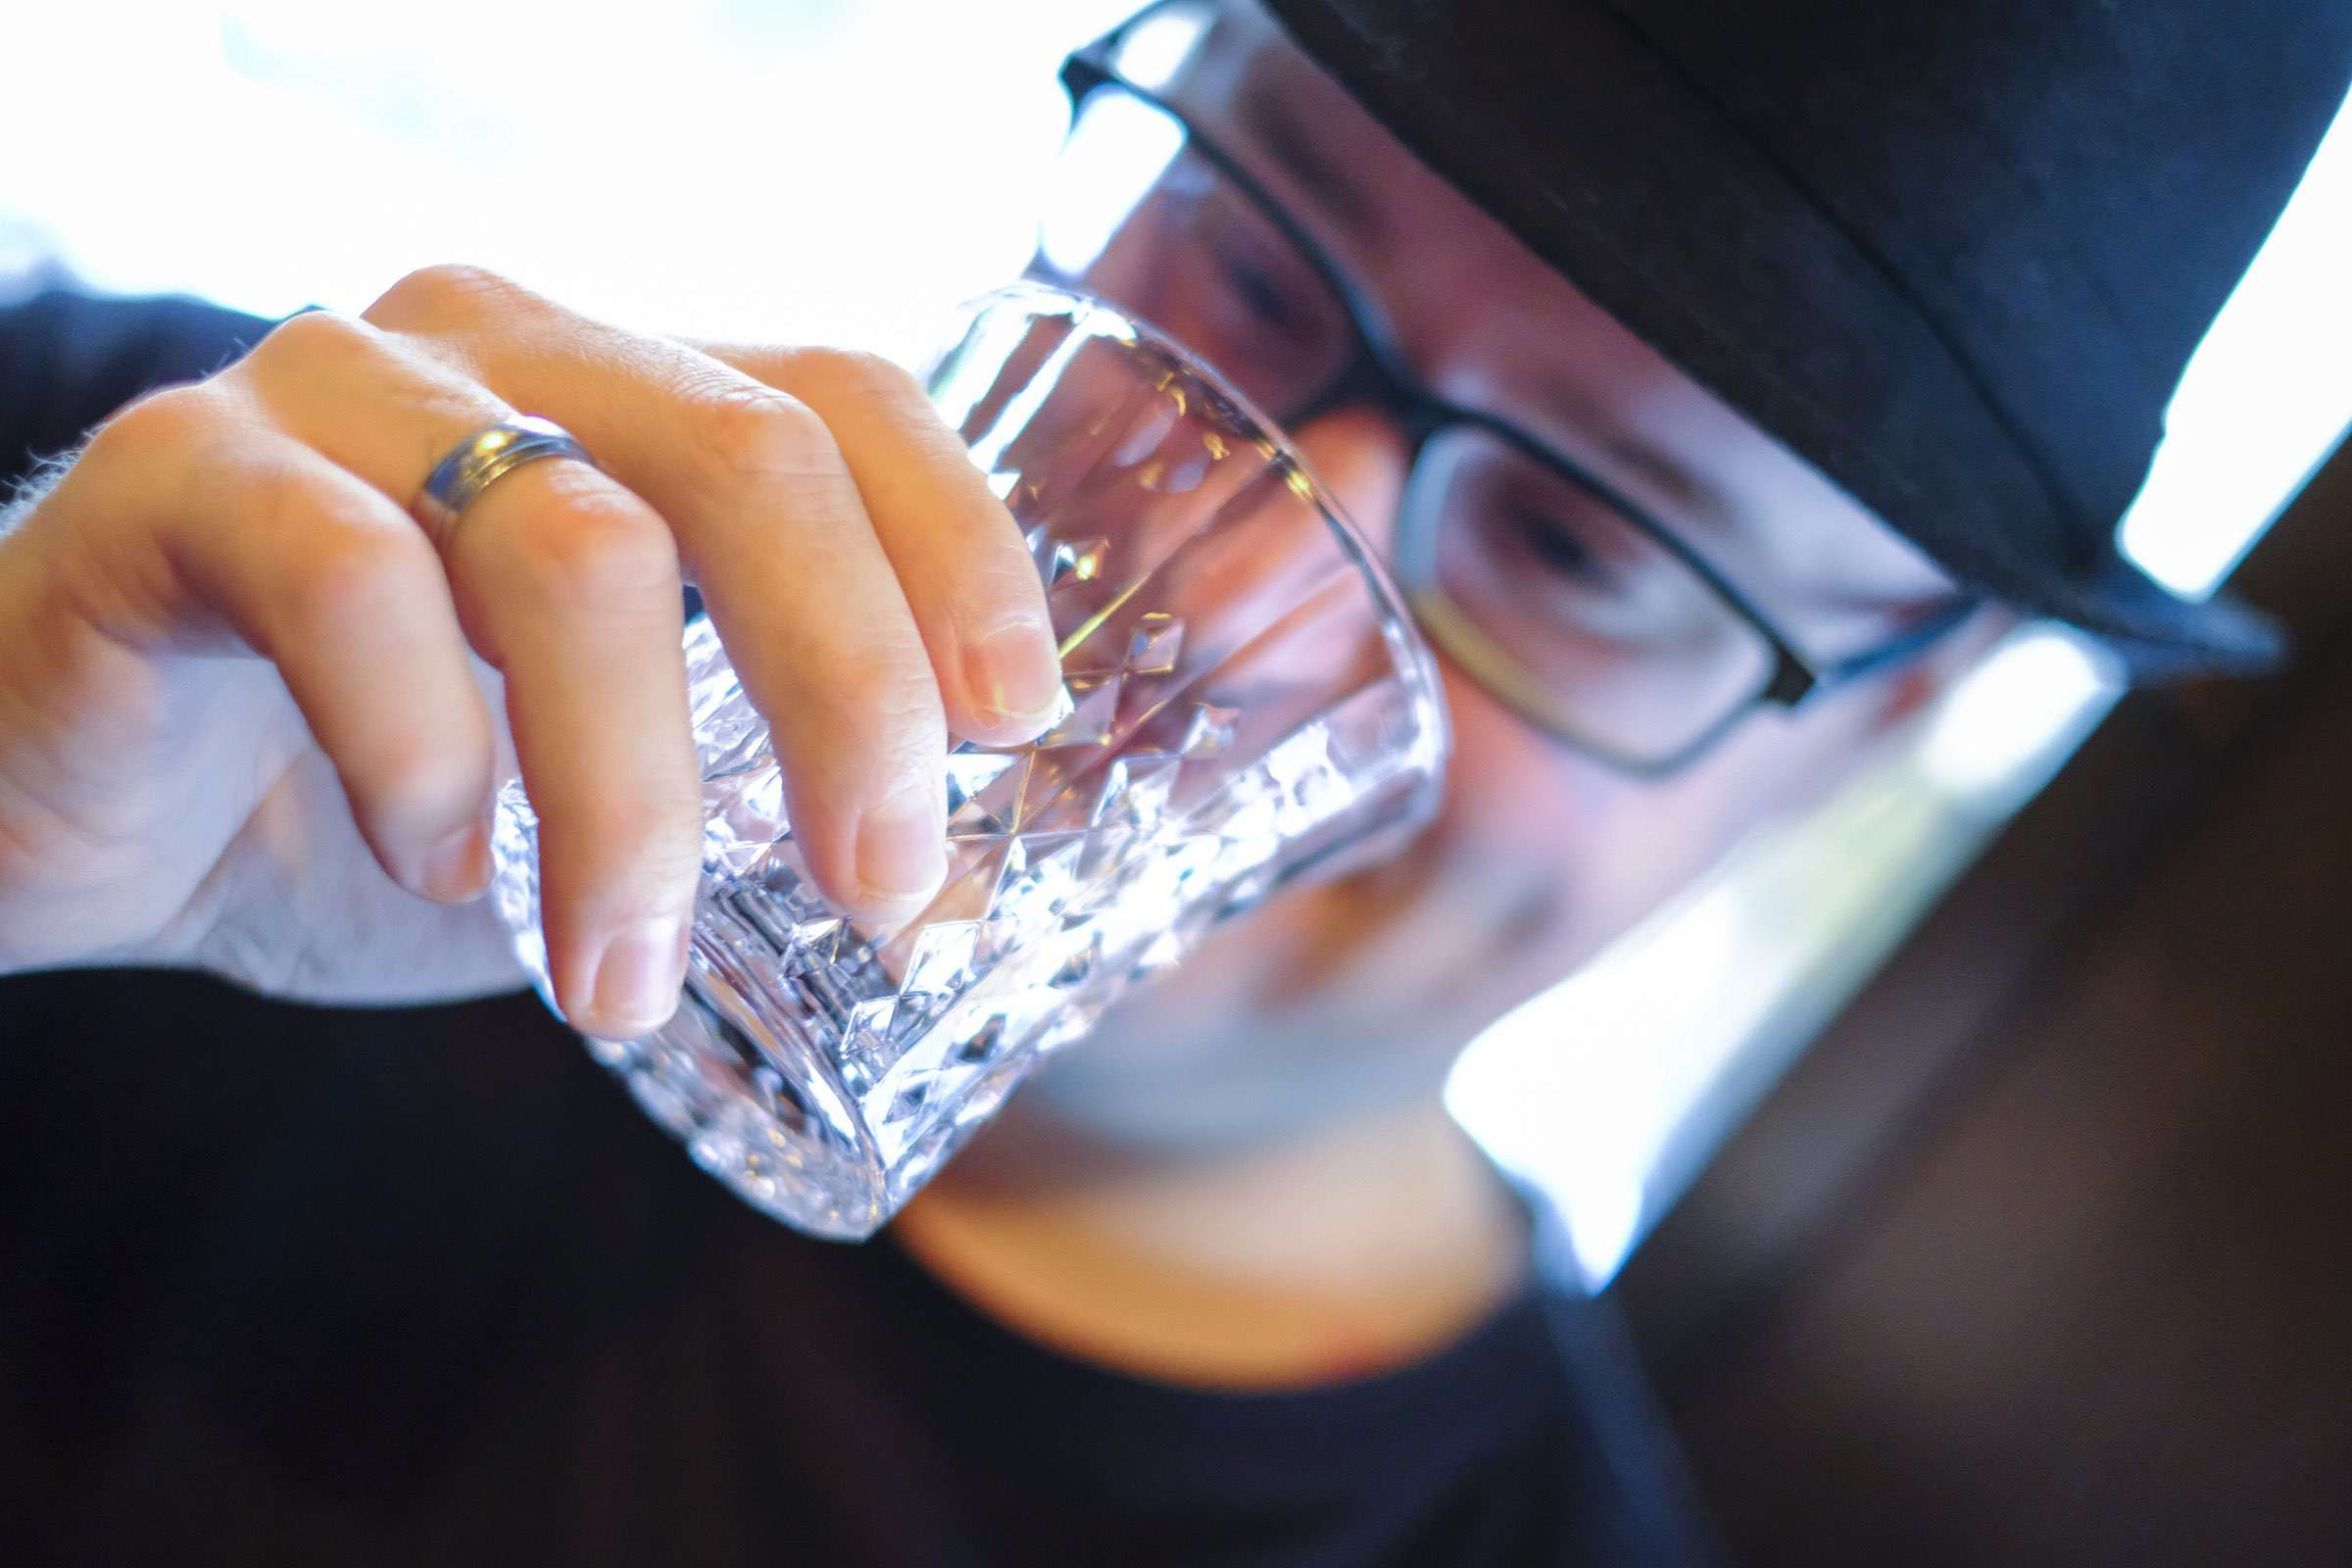 Patron – Premium Tequila in Handmade